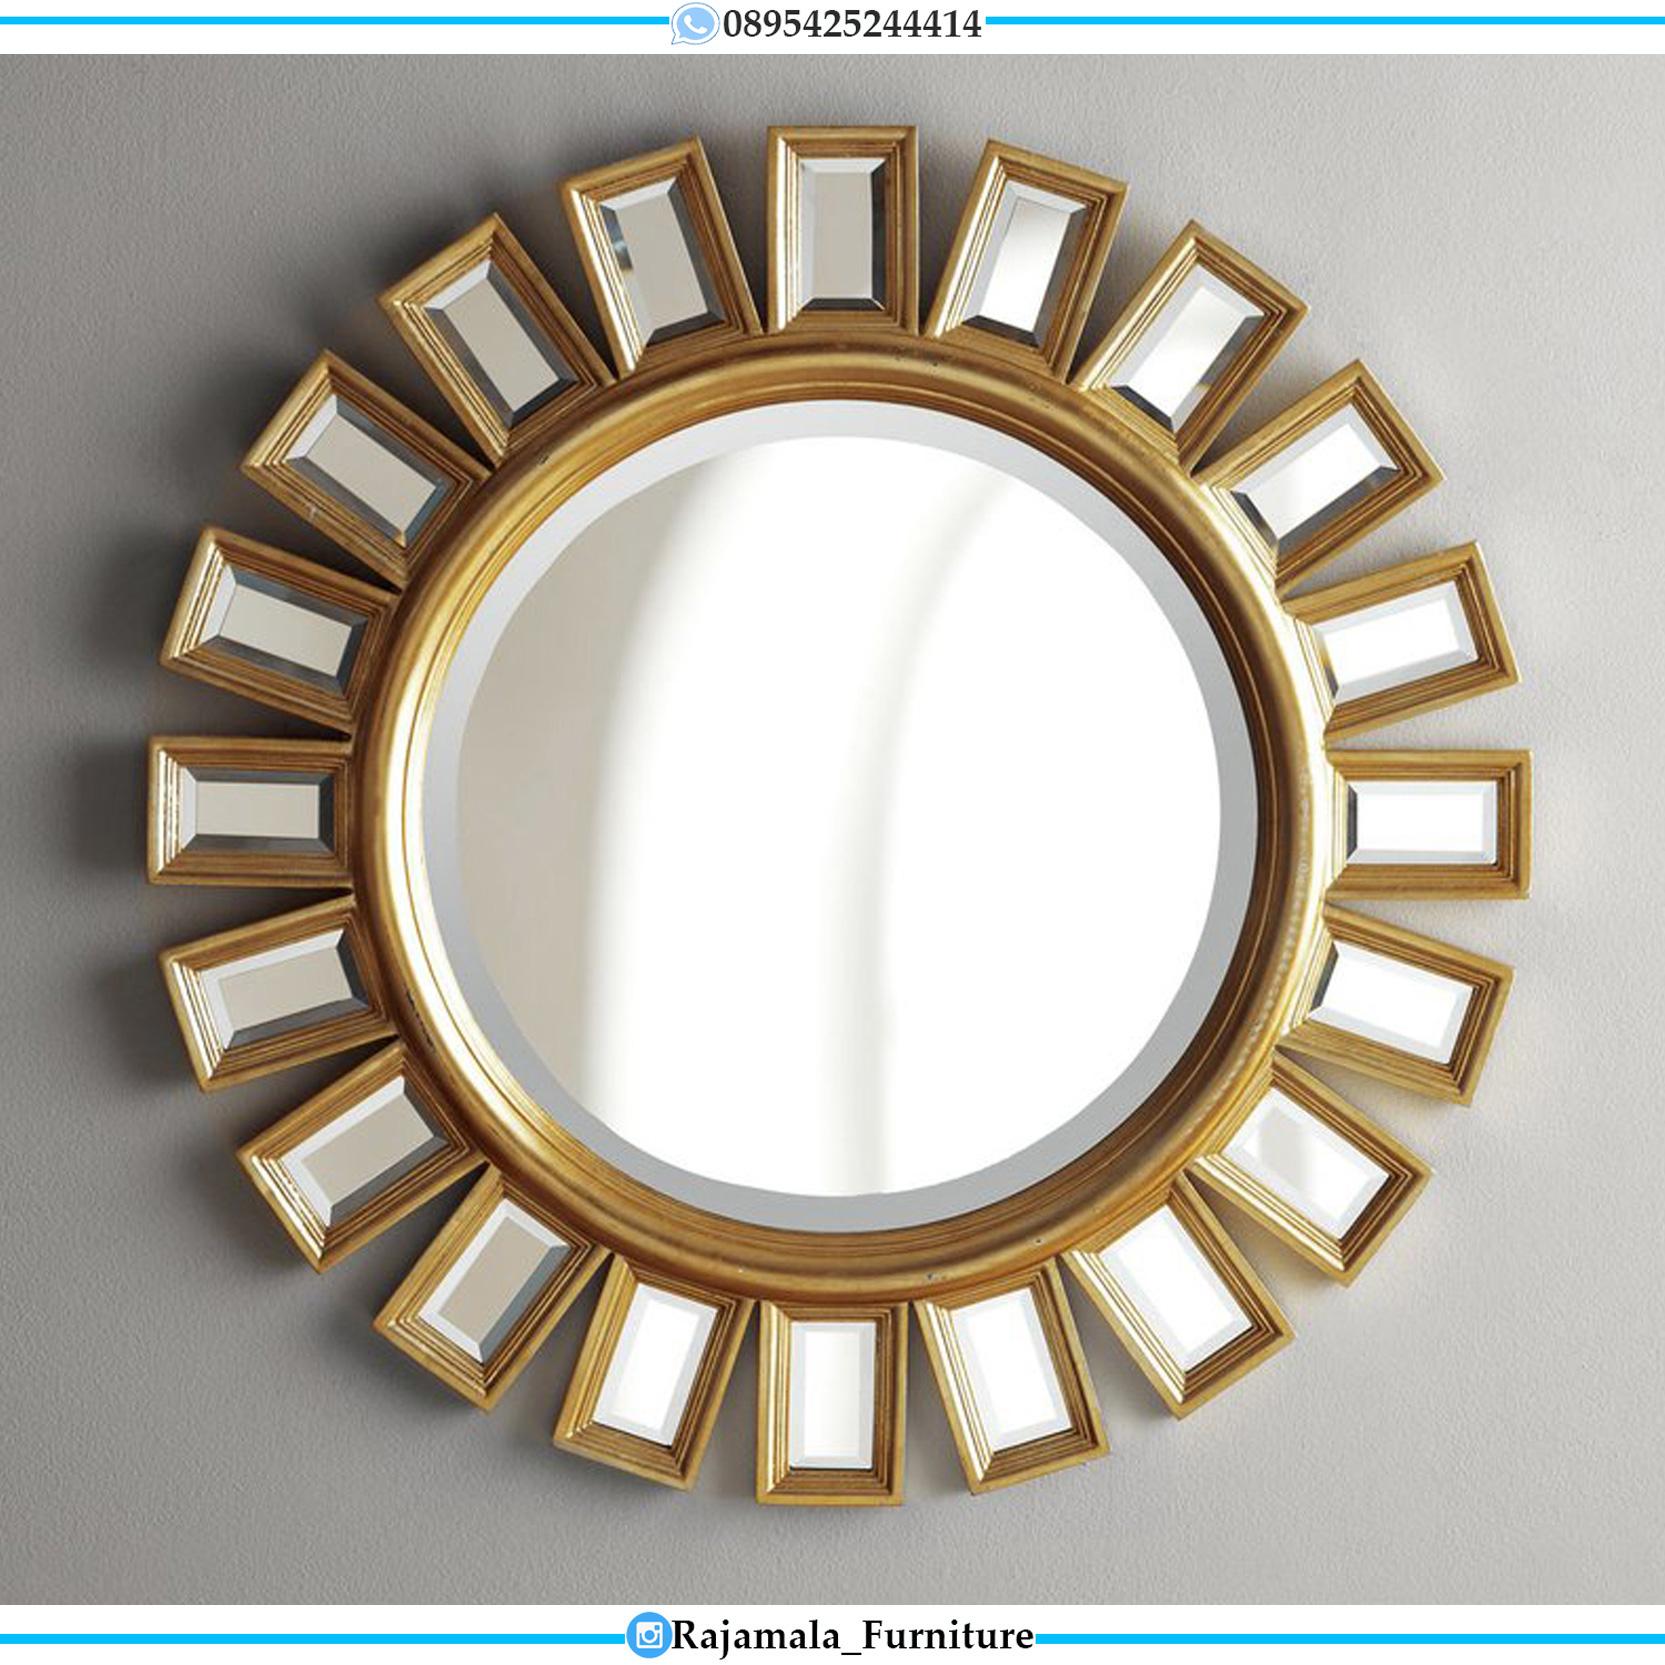 Best Sale Cermin Hias Minimalis Mewah Jepara Luxury Design RM-0115